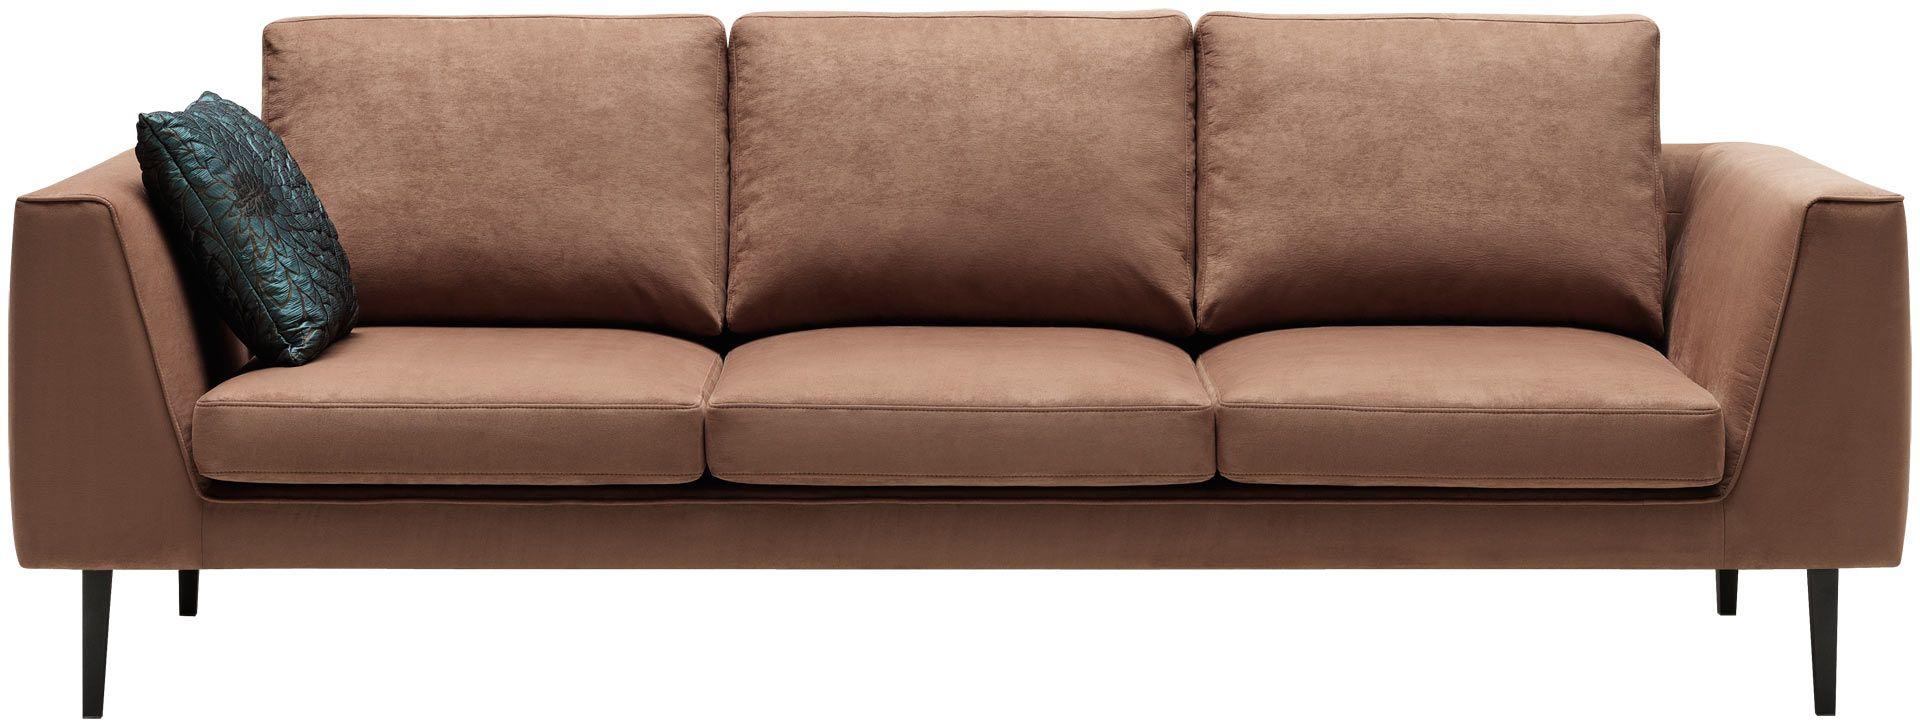 Modern Rhodos Sofas Quality From Boconcept Boconcept Sofa Modern